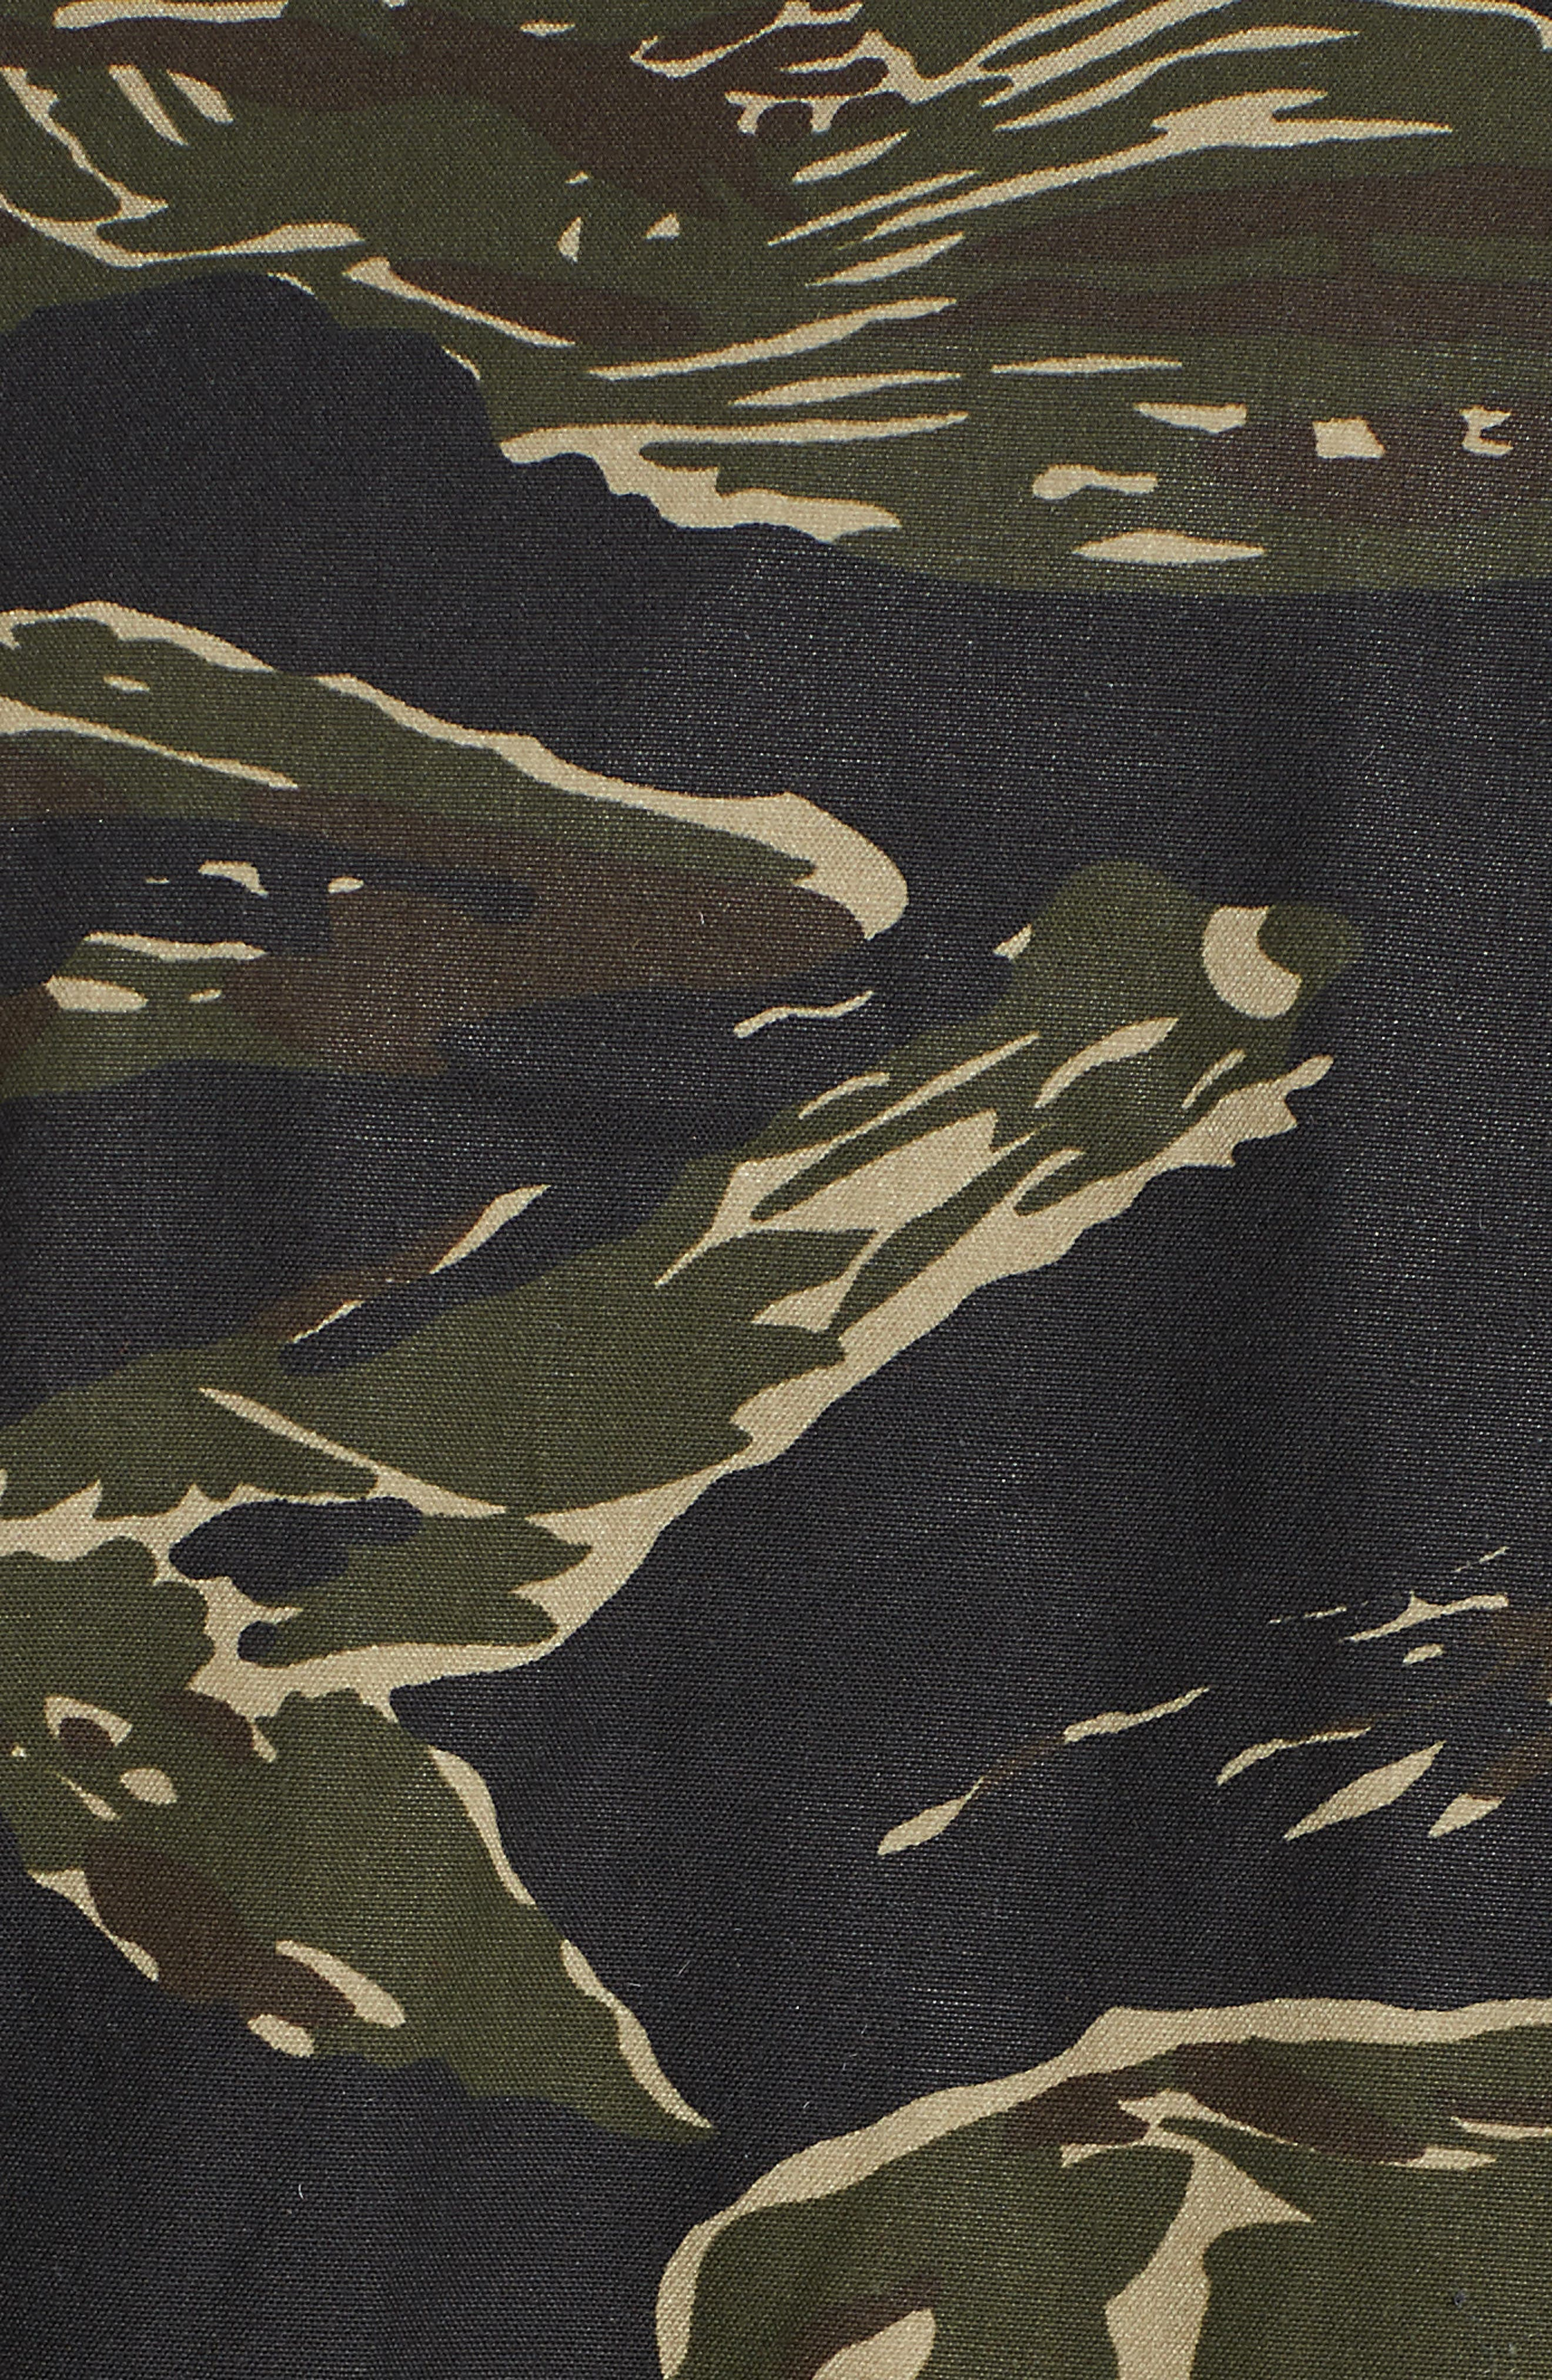 M-65 Defender Waxed Camo Field Jacket,                             Alternate thumbnail 6, color,                             TIGER CAMO